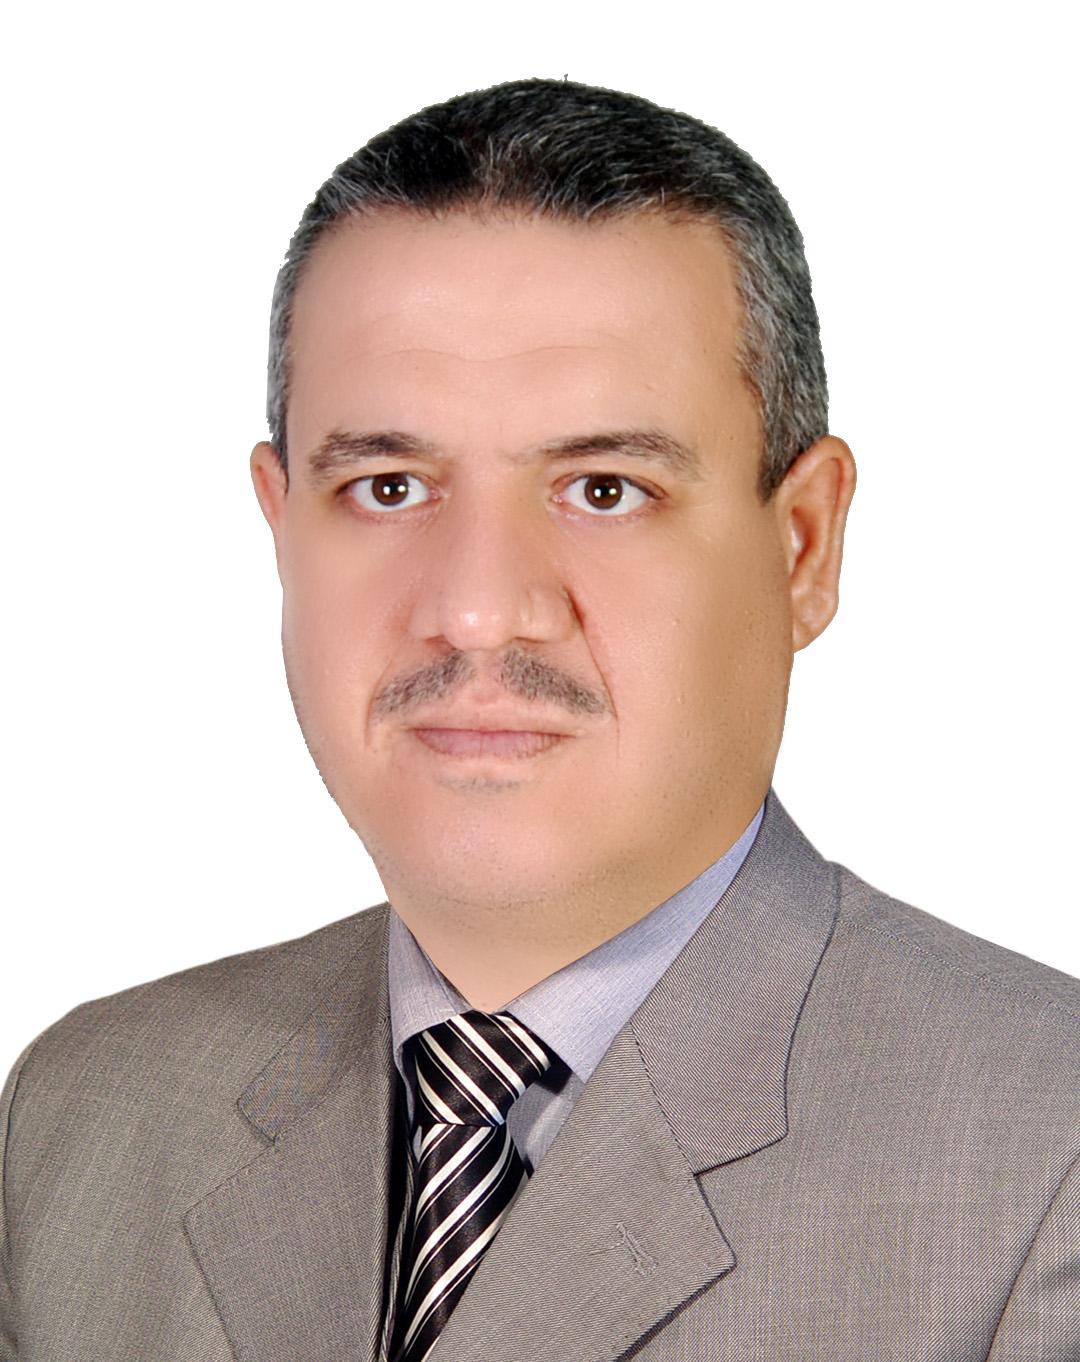 Dr.Muayad Hasan Mohammed Shadher Albehadili